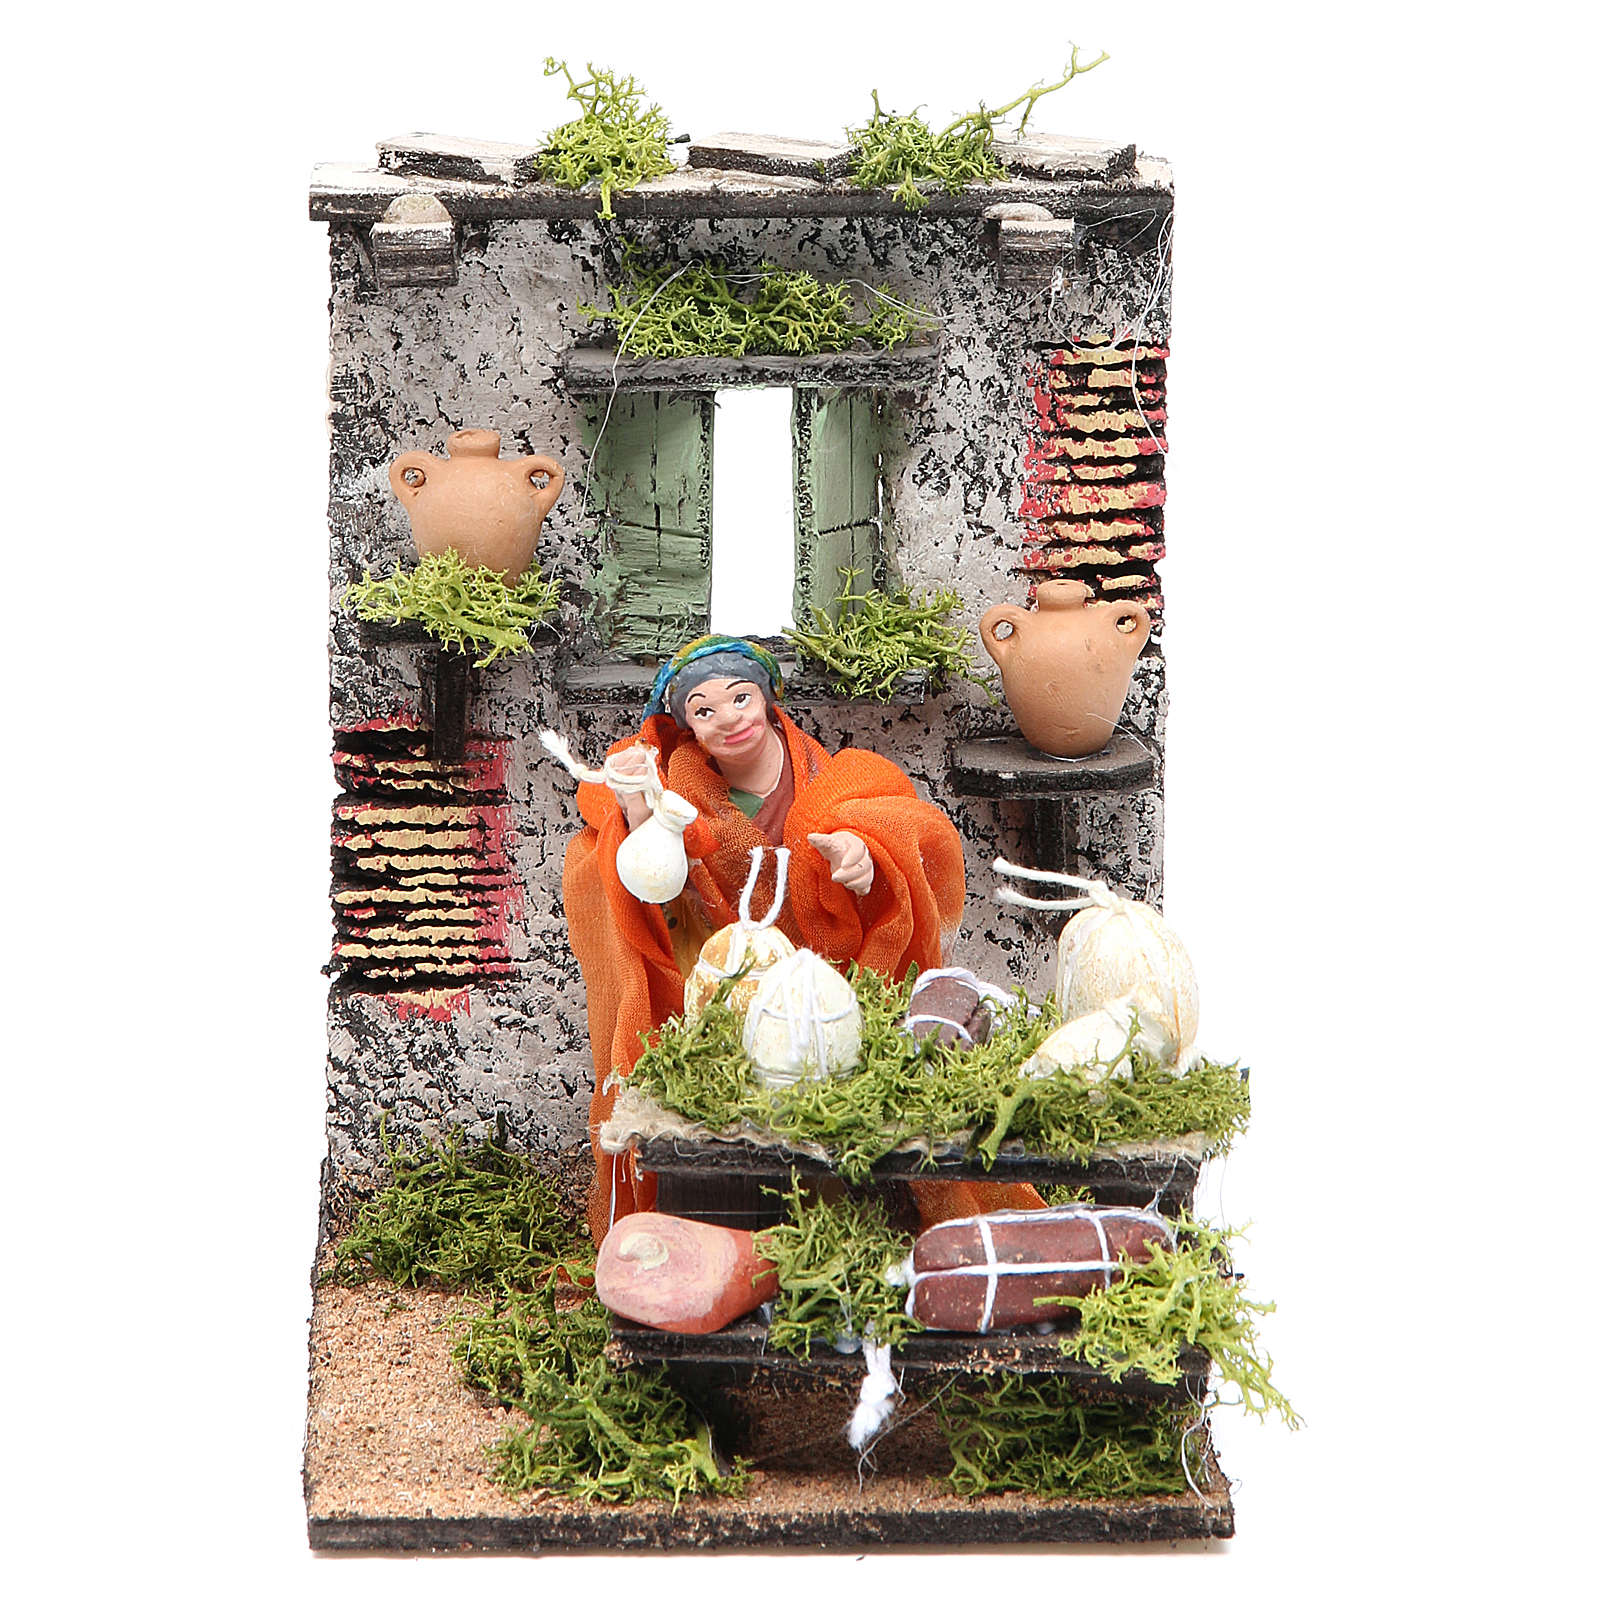 Salami seller animated figurine for Neapolitan Nativity, 10cm 4